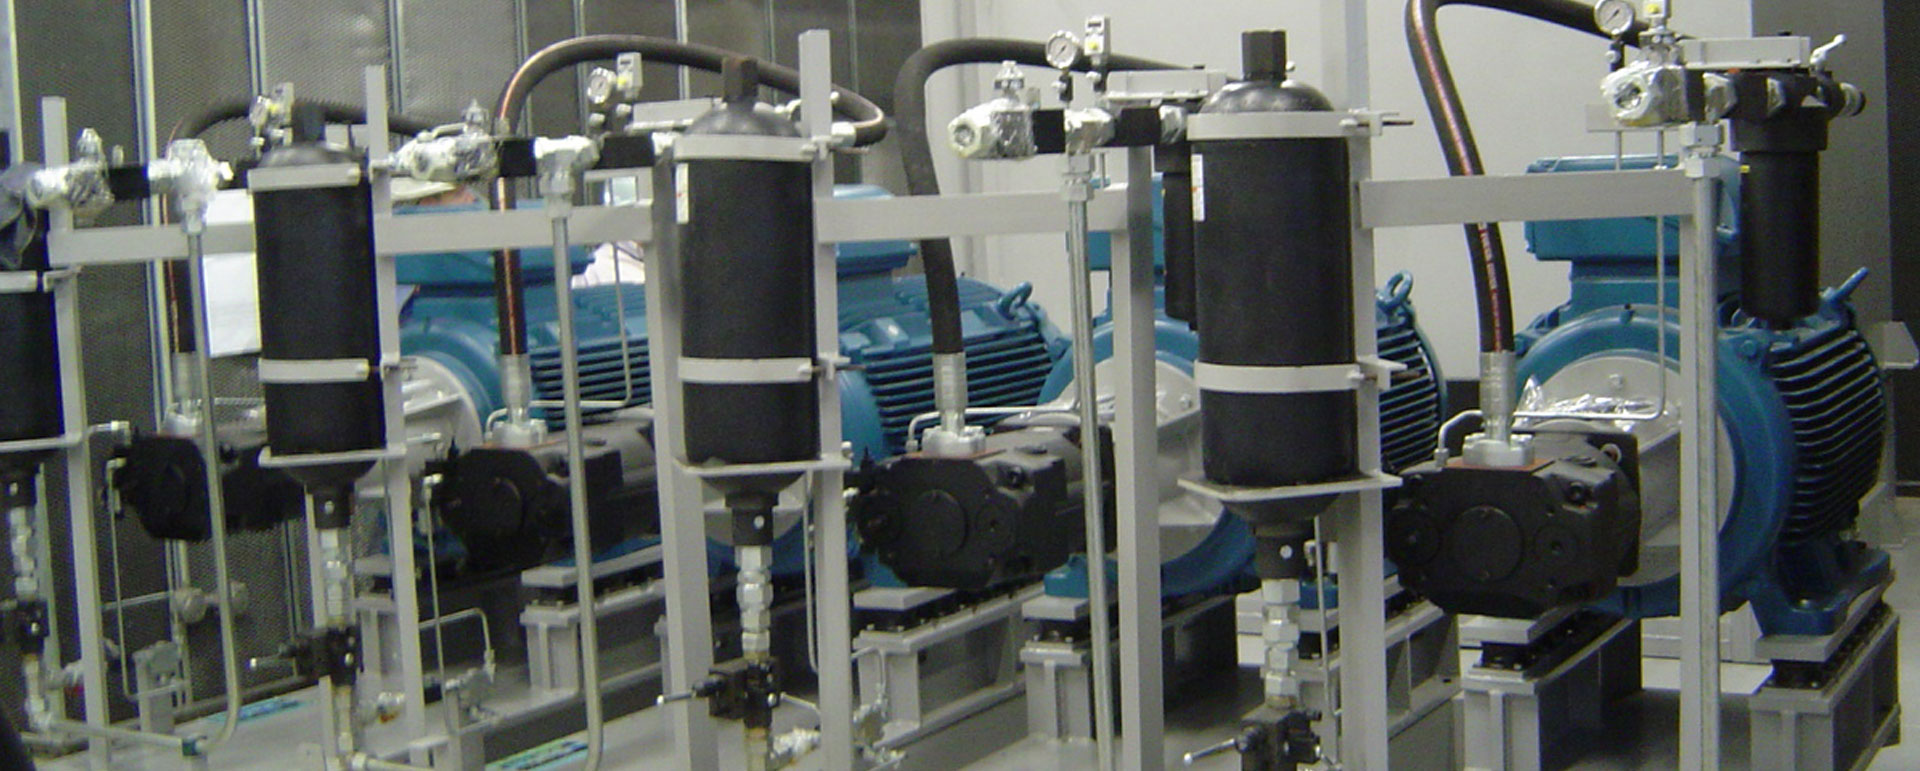 JSL Hidráulica e Pneumática - Unidade Hidráulicas